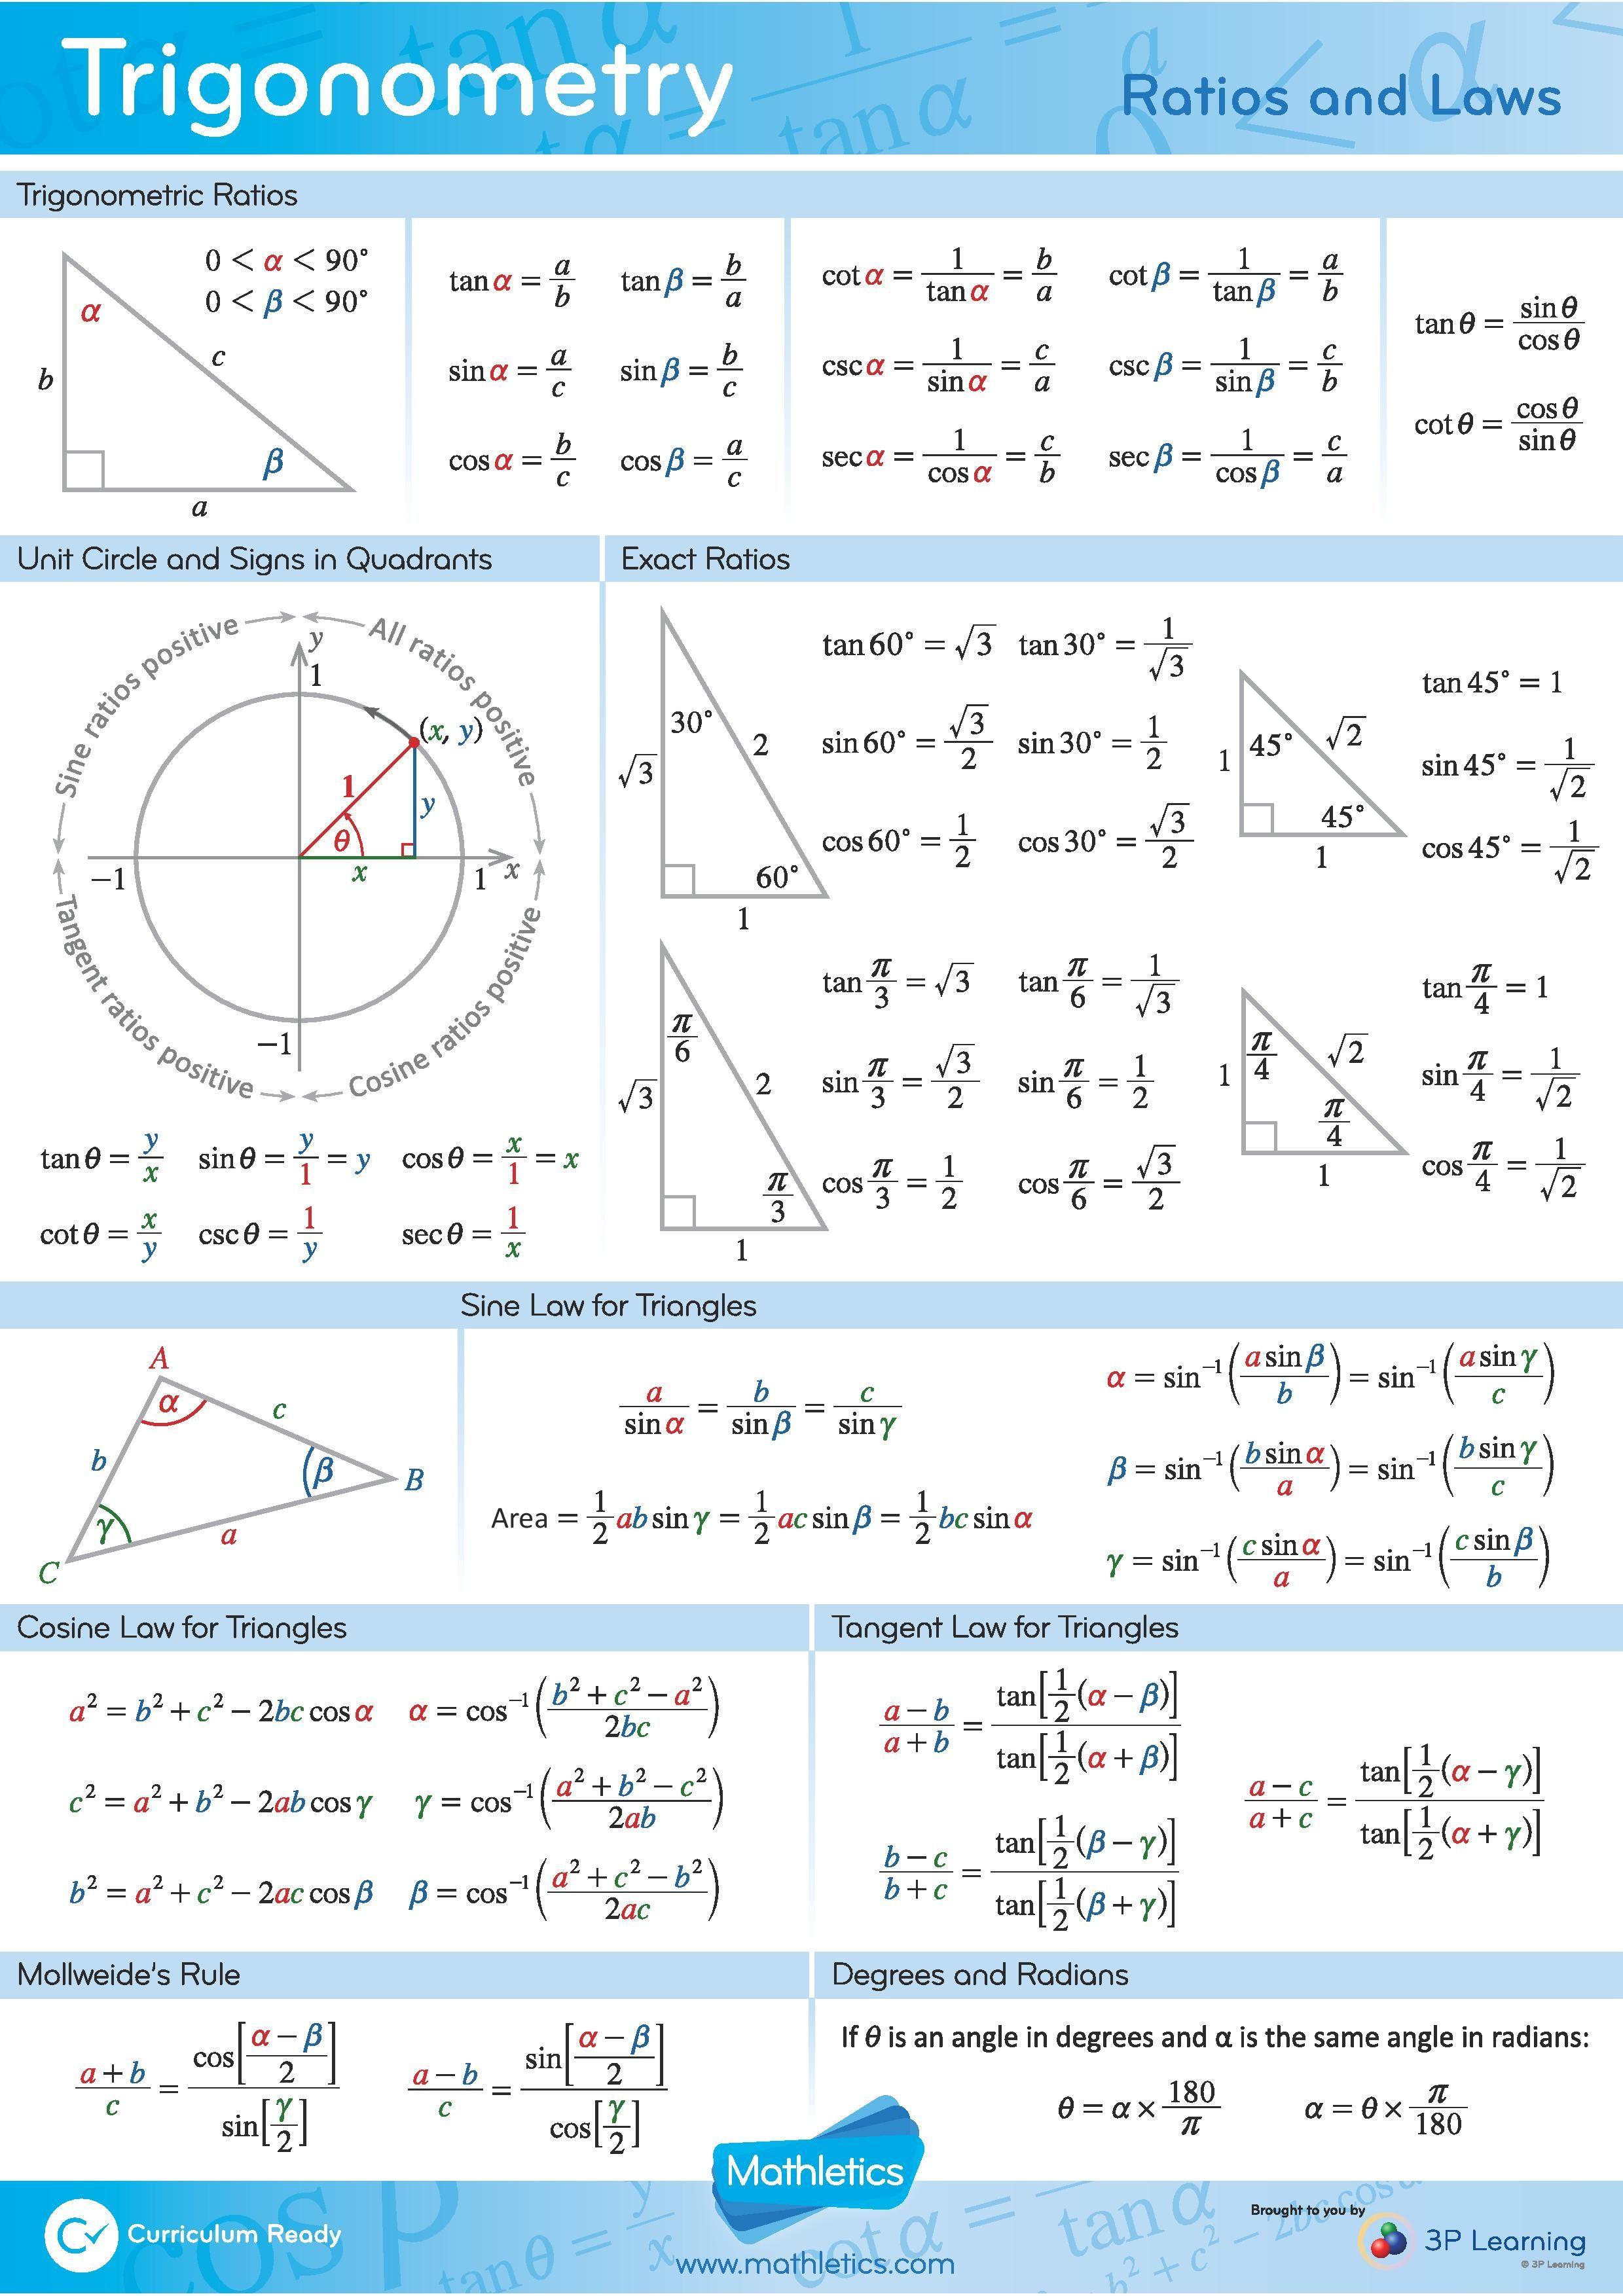 Trigonometry Ratios And Laws Mathletics Formulae And Laws Factsheet Free Download Availa Math Tutorials Mathematics Education Learning Mathematics